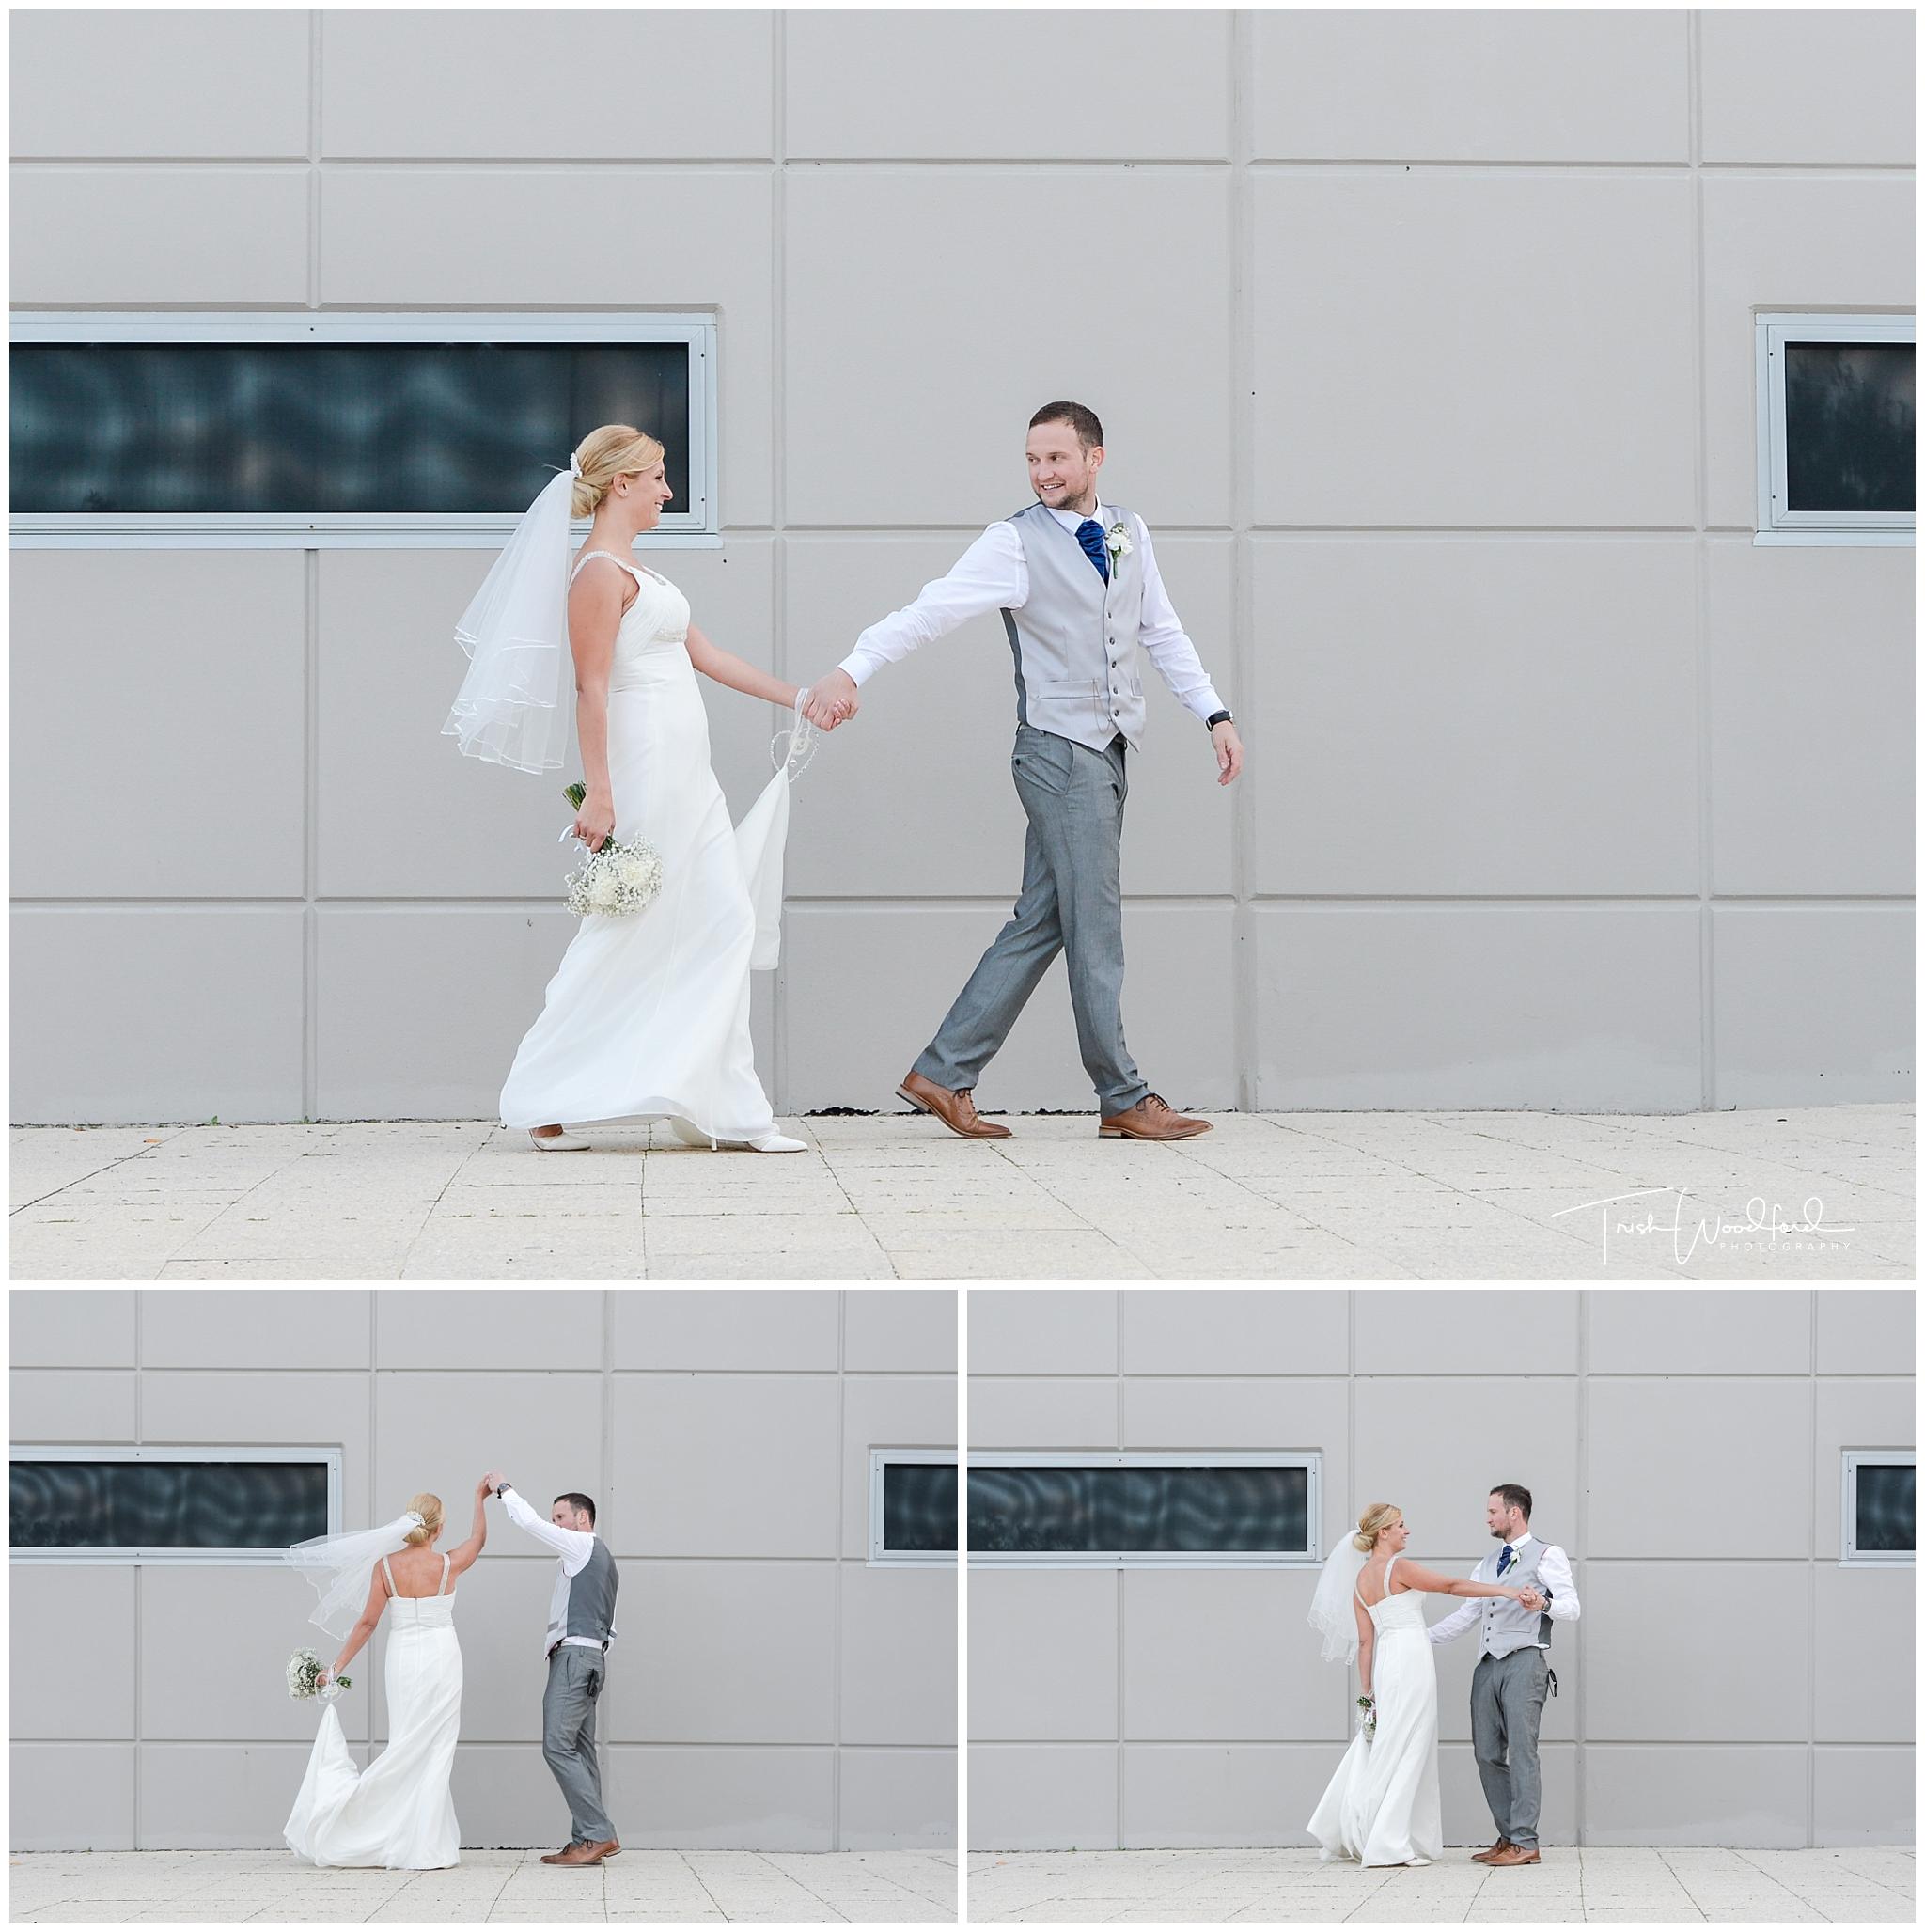 Perth Wedding Photography Bride & Groom Portrait